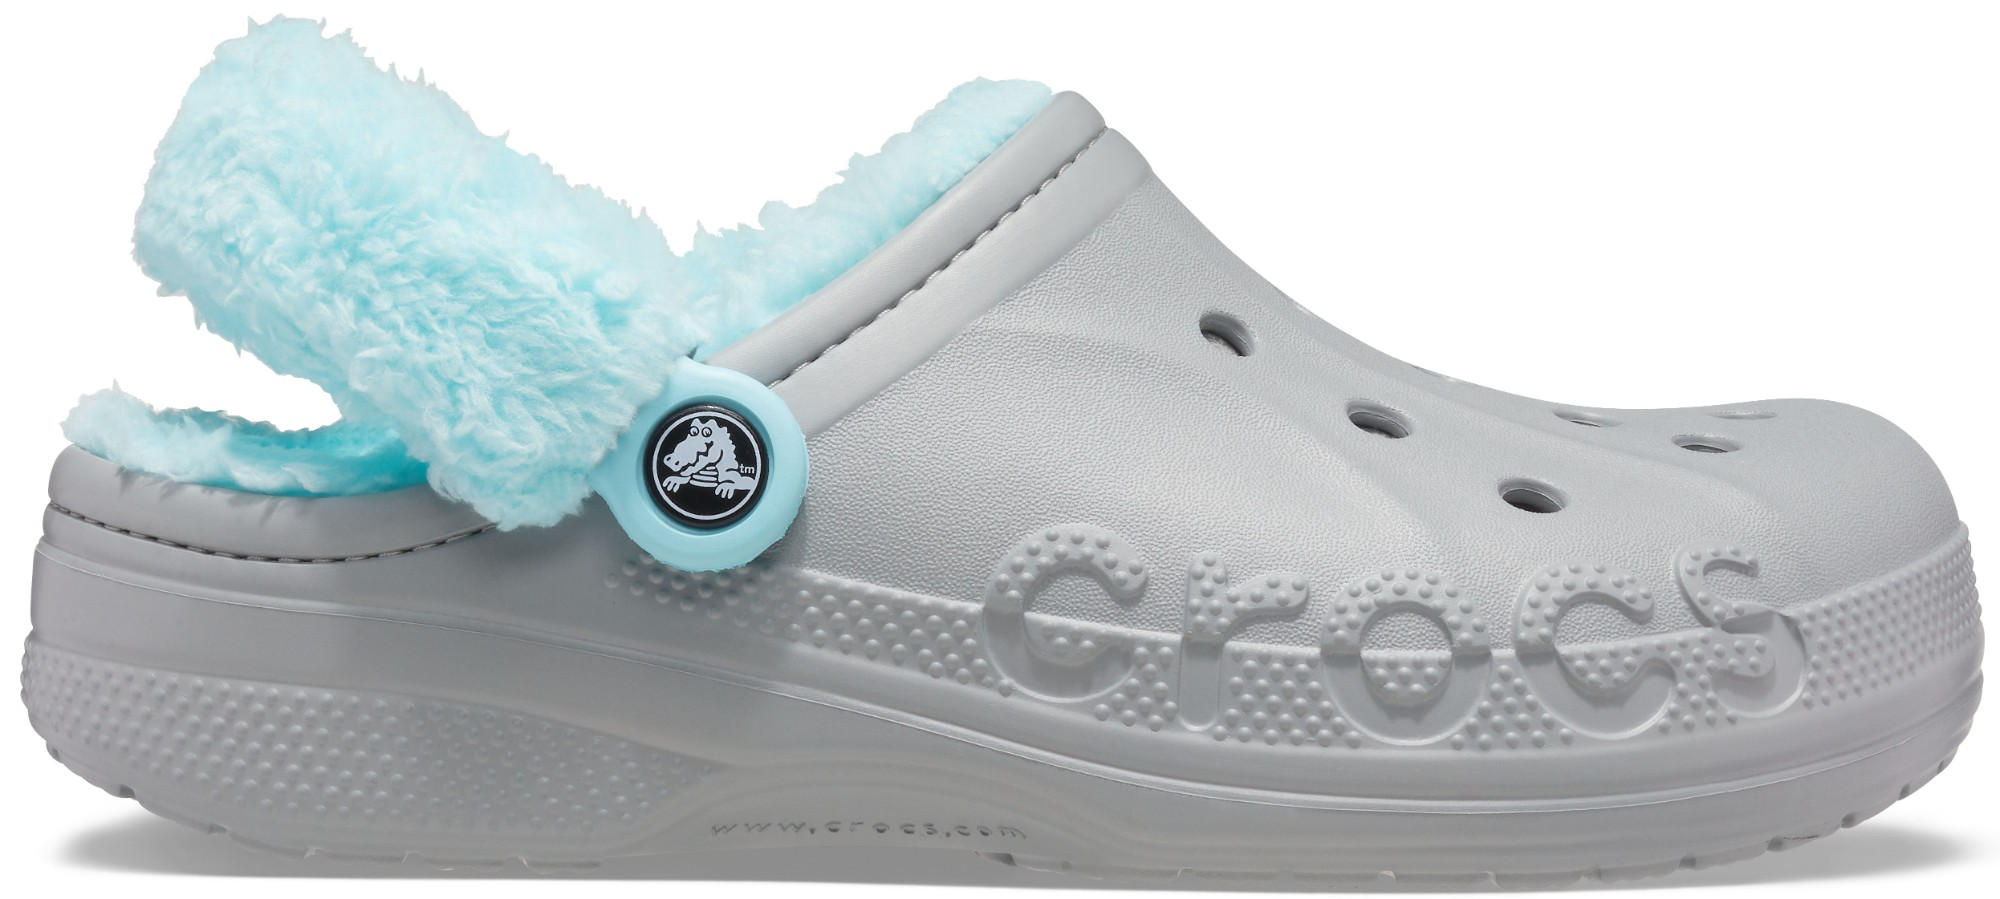 Crocs™ Baya Lined Fuzz Strap Clog Light Grey/Ice Blue 41